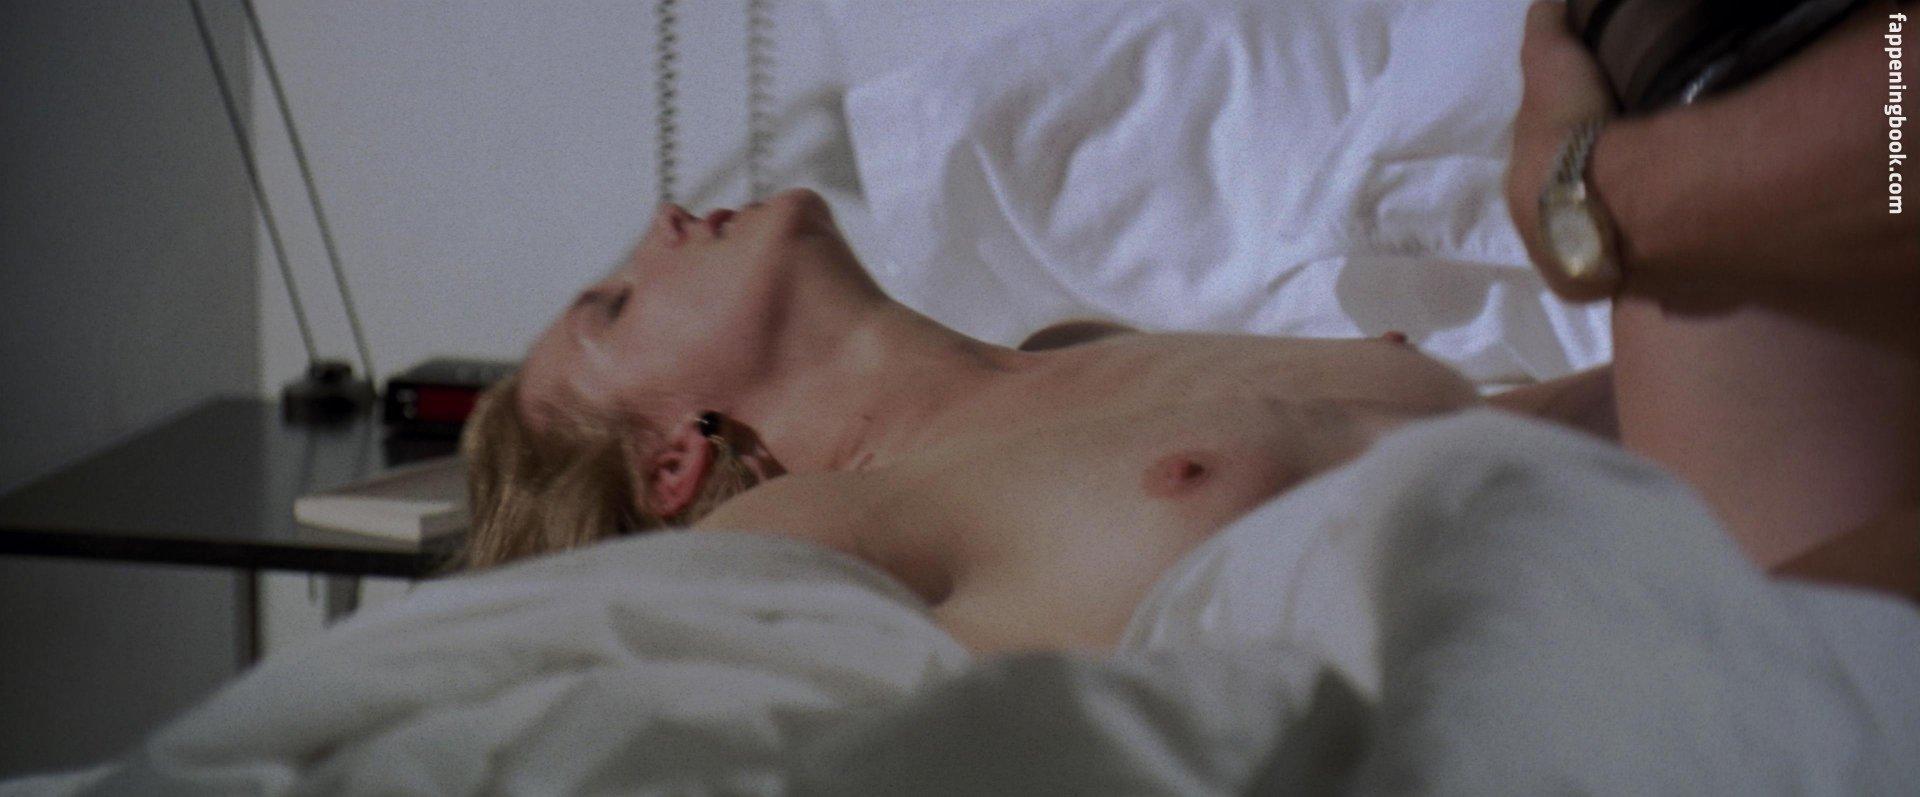 Angela Covello Nude krista sutton nude, sexy, the fappening, uncensored - photo